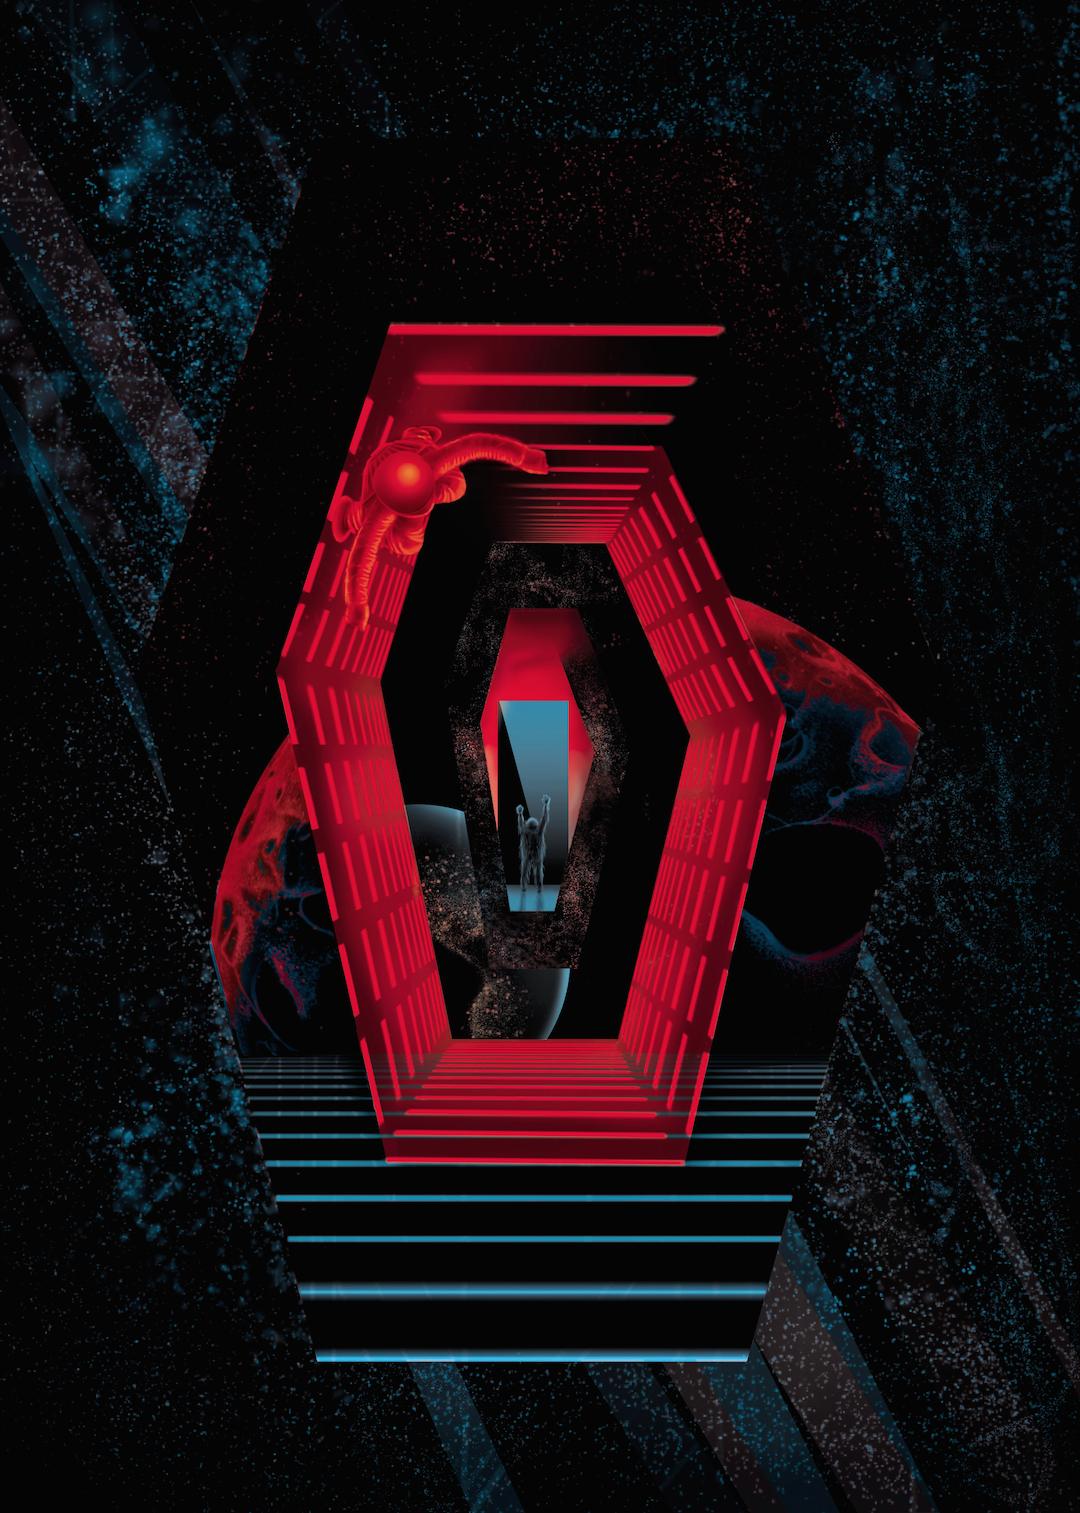 """2001:A SPACE ODYSSEY: COVER""  Digital, 11""x14"", 2016"